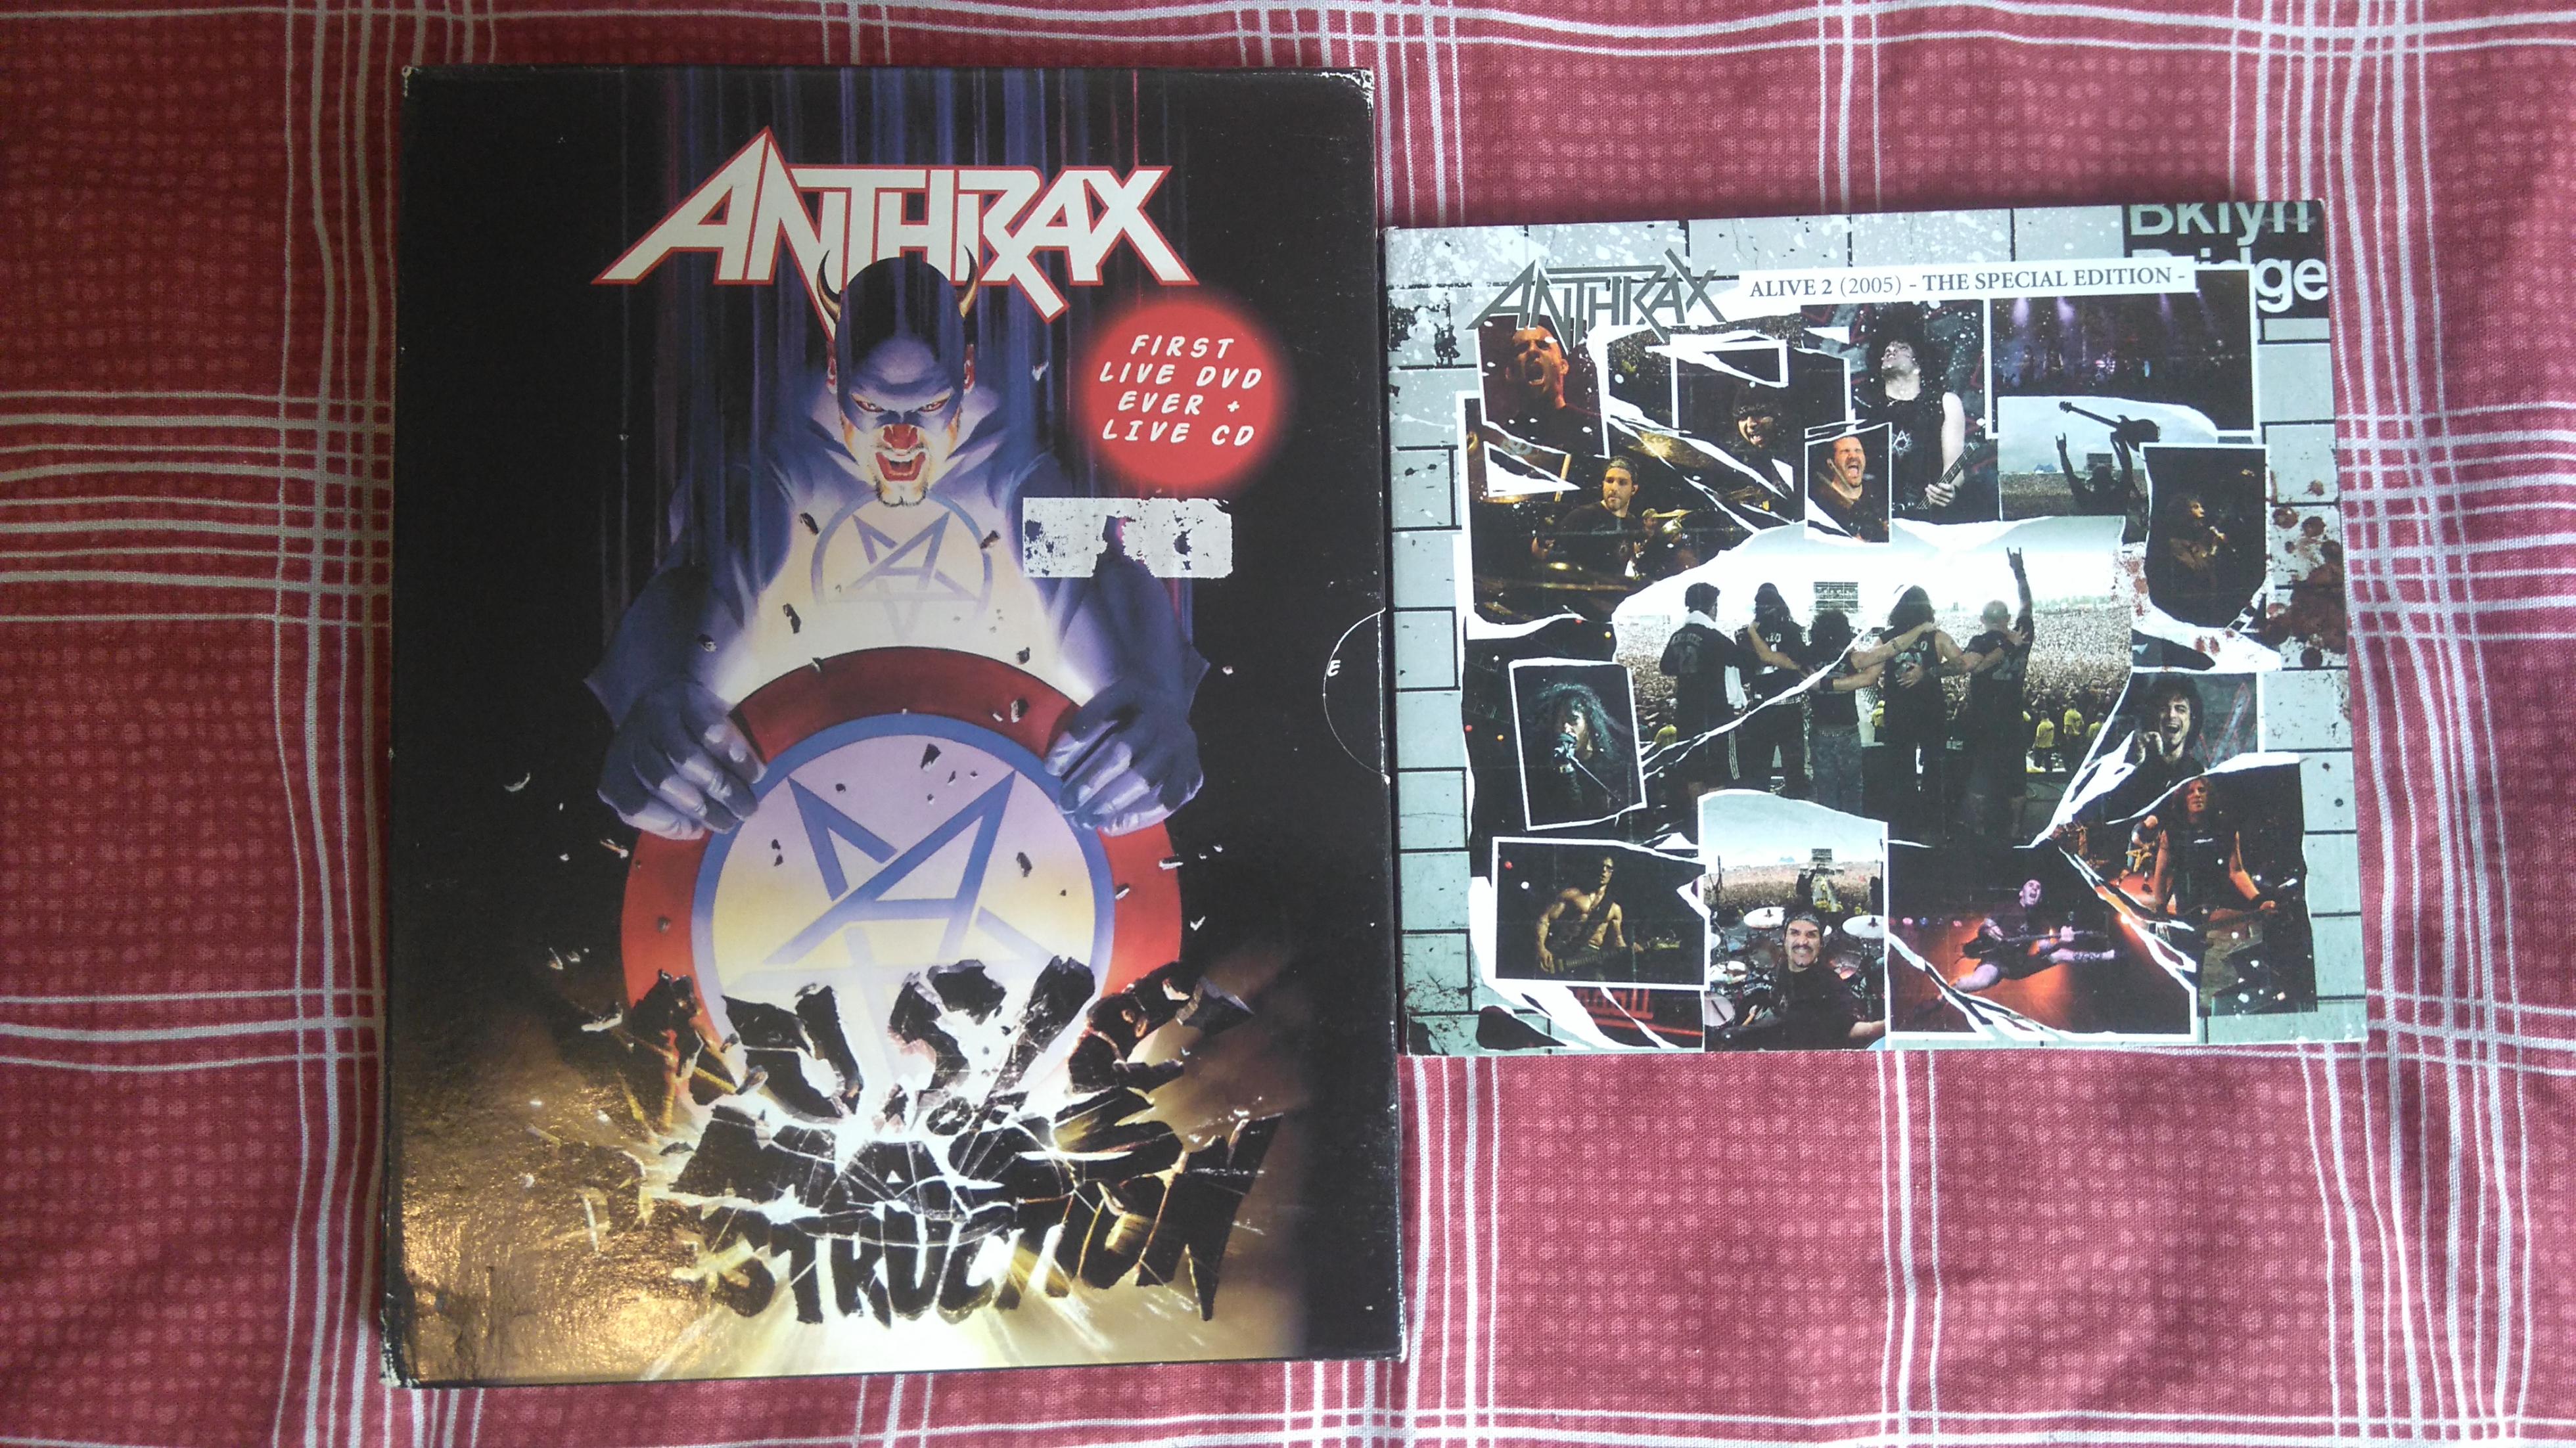 Anthrax DVD.JPG